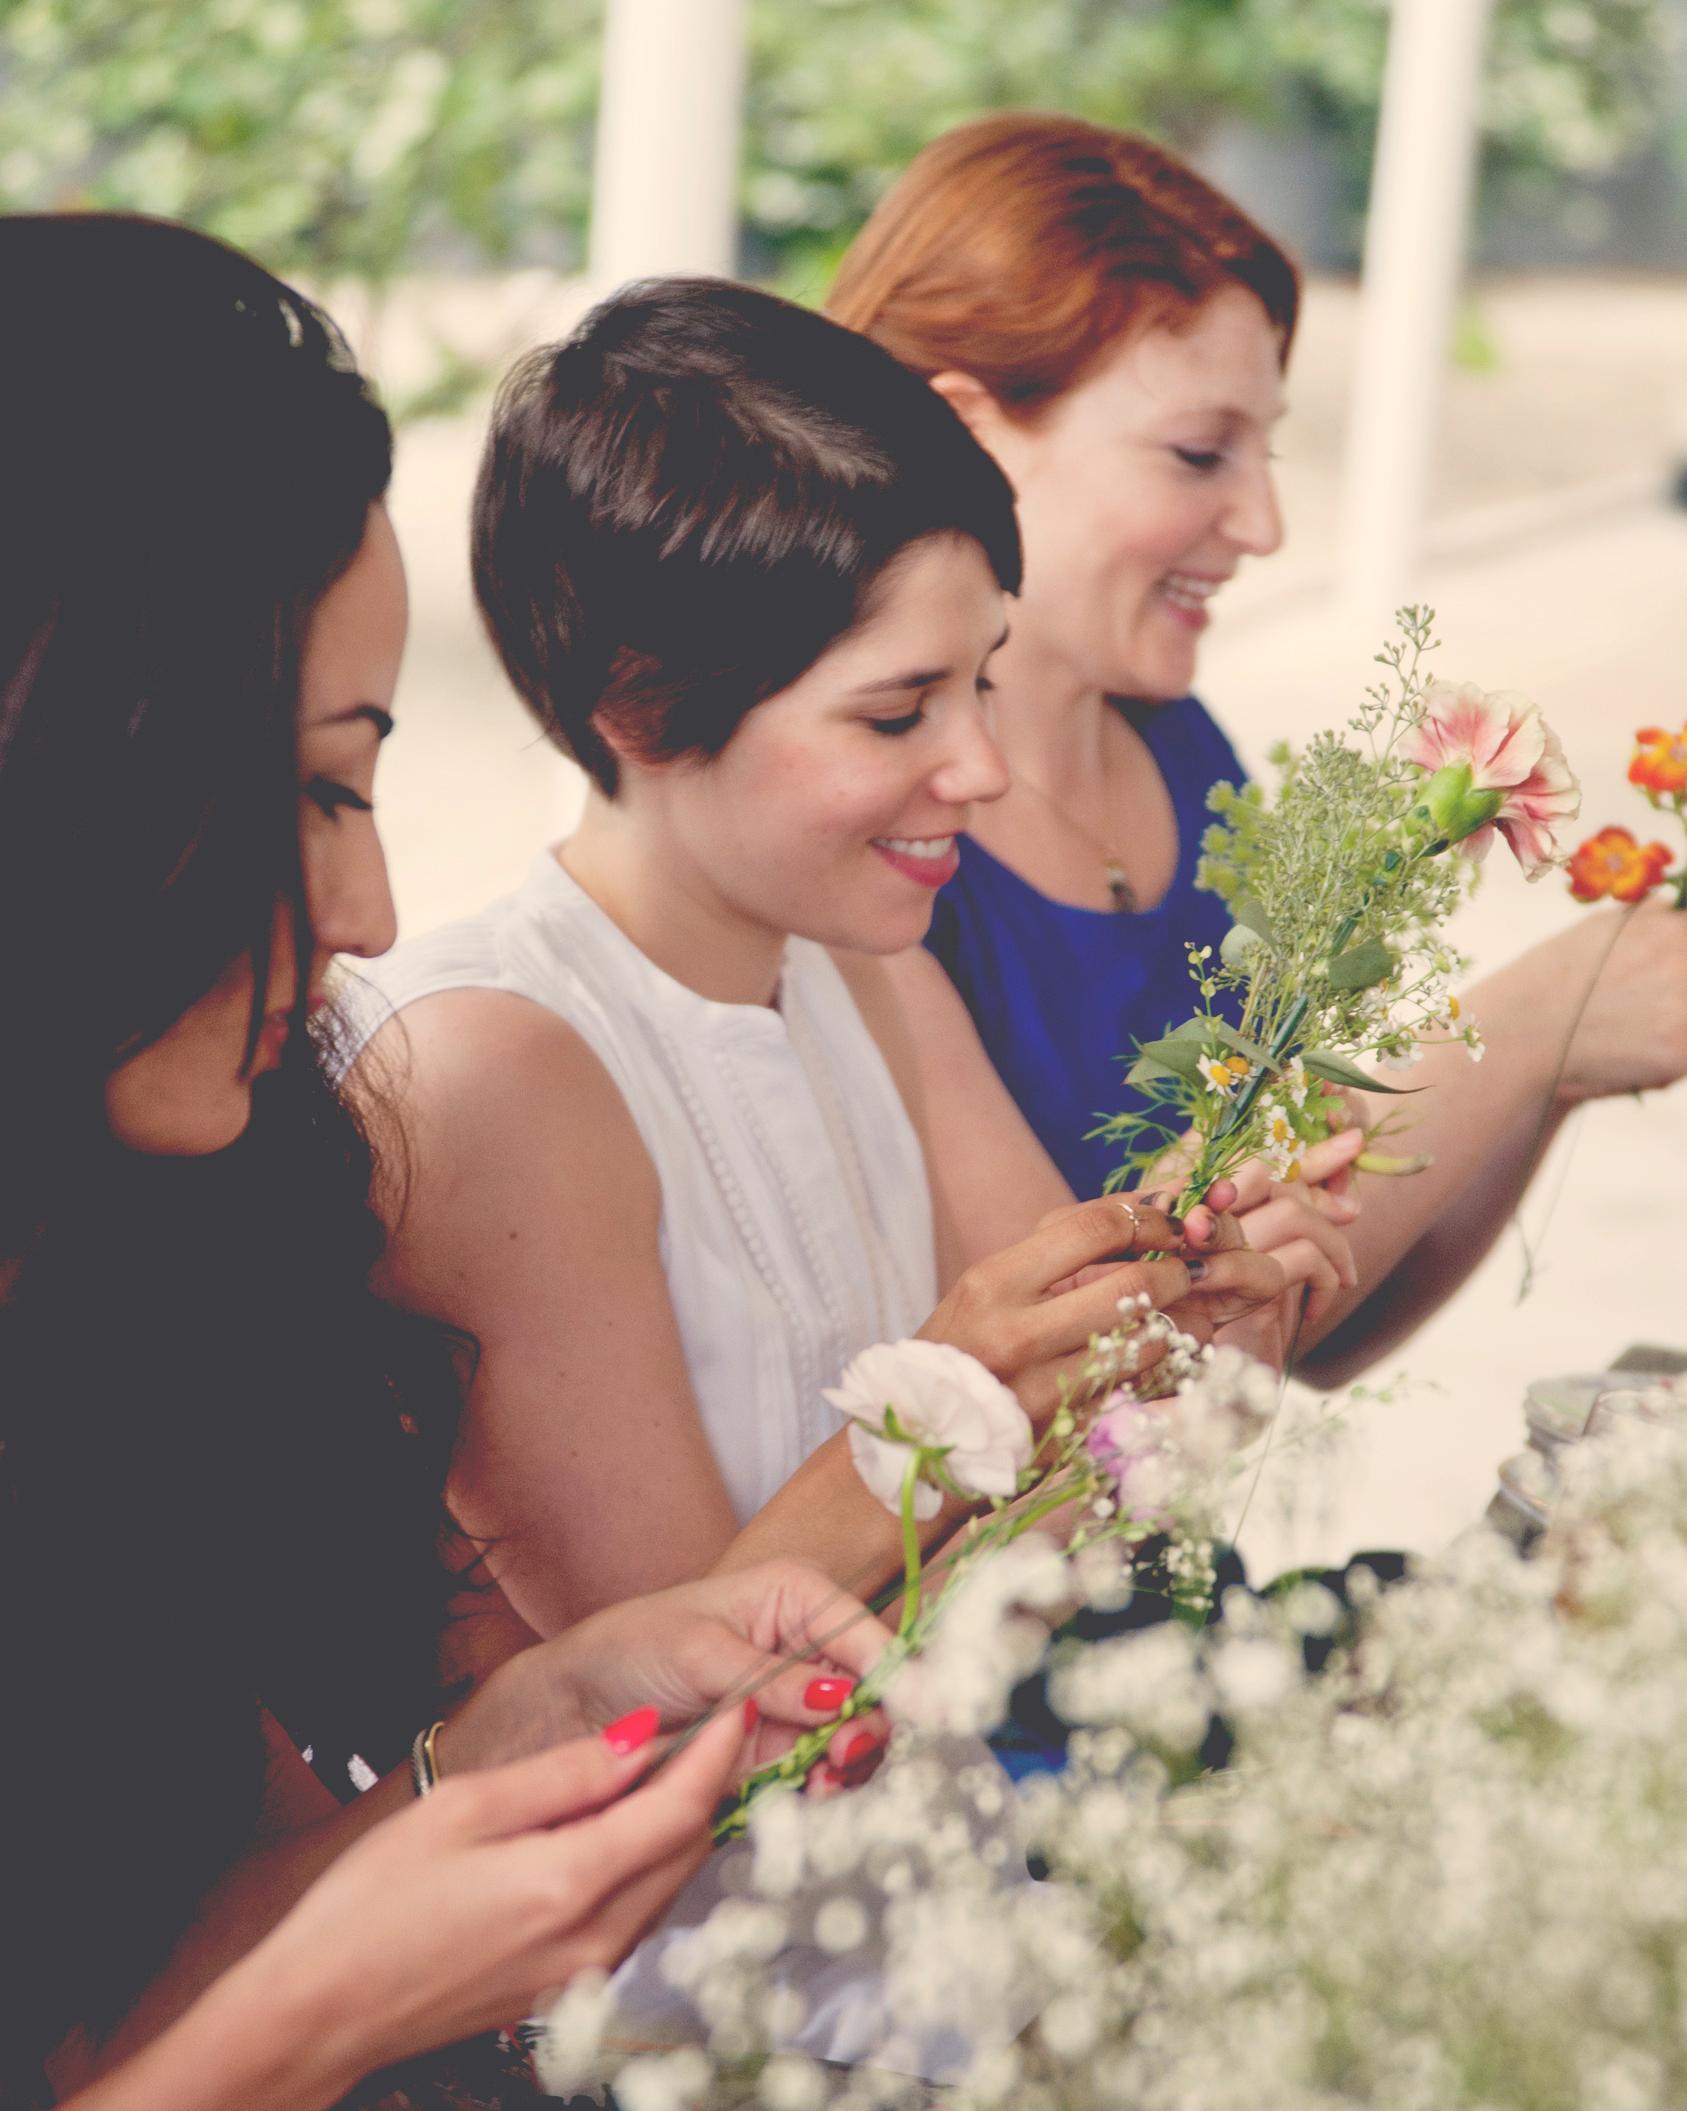 claire-thomas-bridal-shower-garden-friends-crafting2-0814.jpg